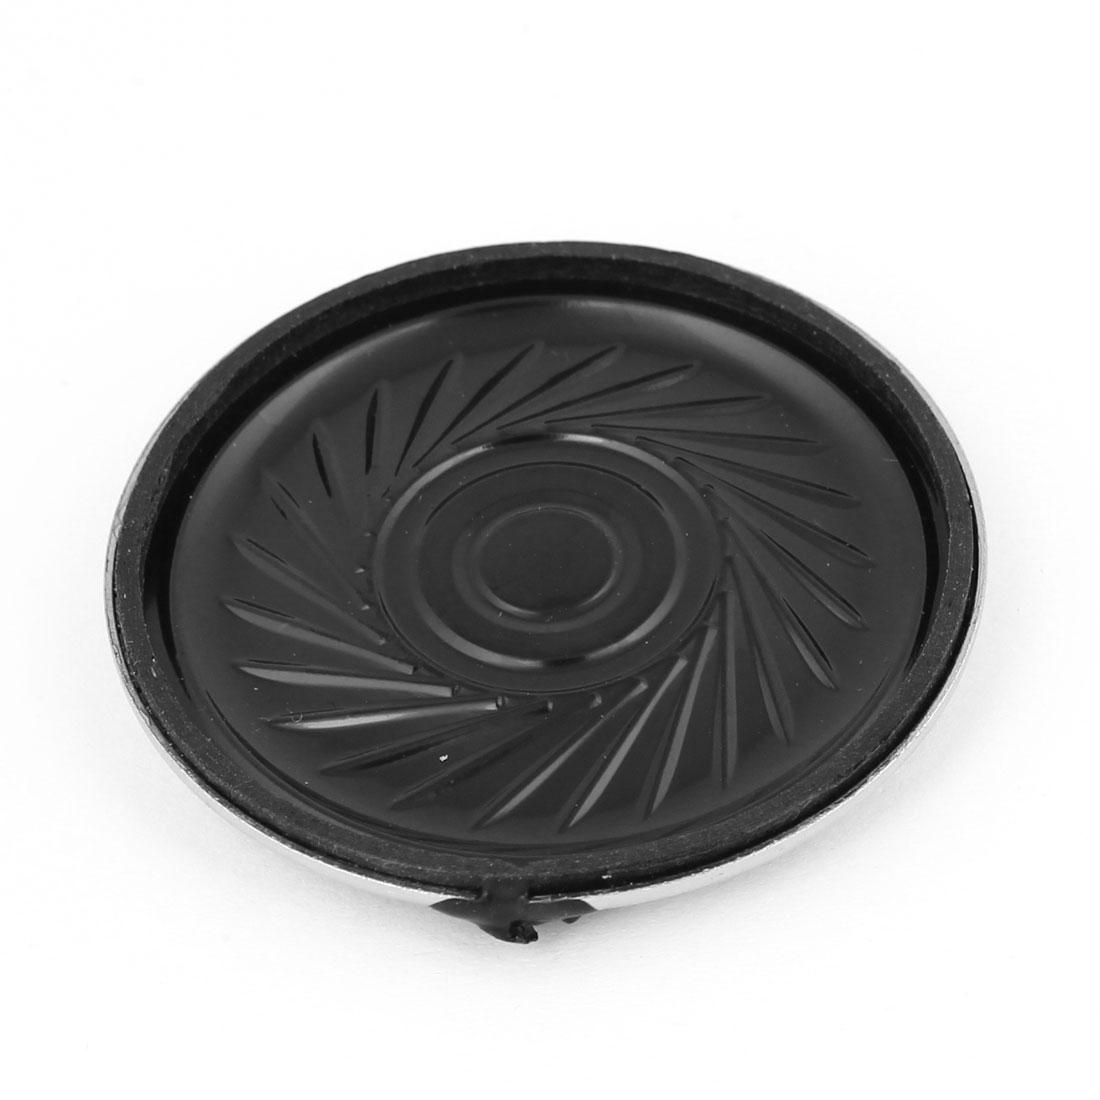 8 Ohm 0.5W 40mm Diameter Round Internal Magnet Speaker for Toys